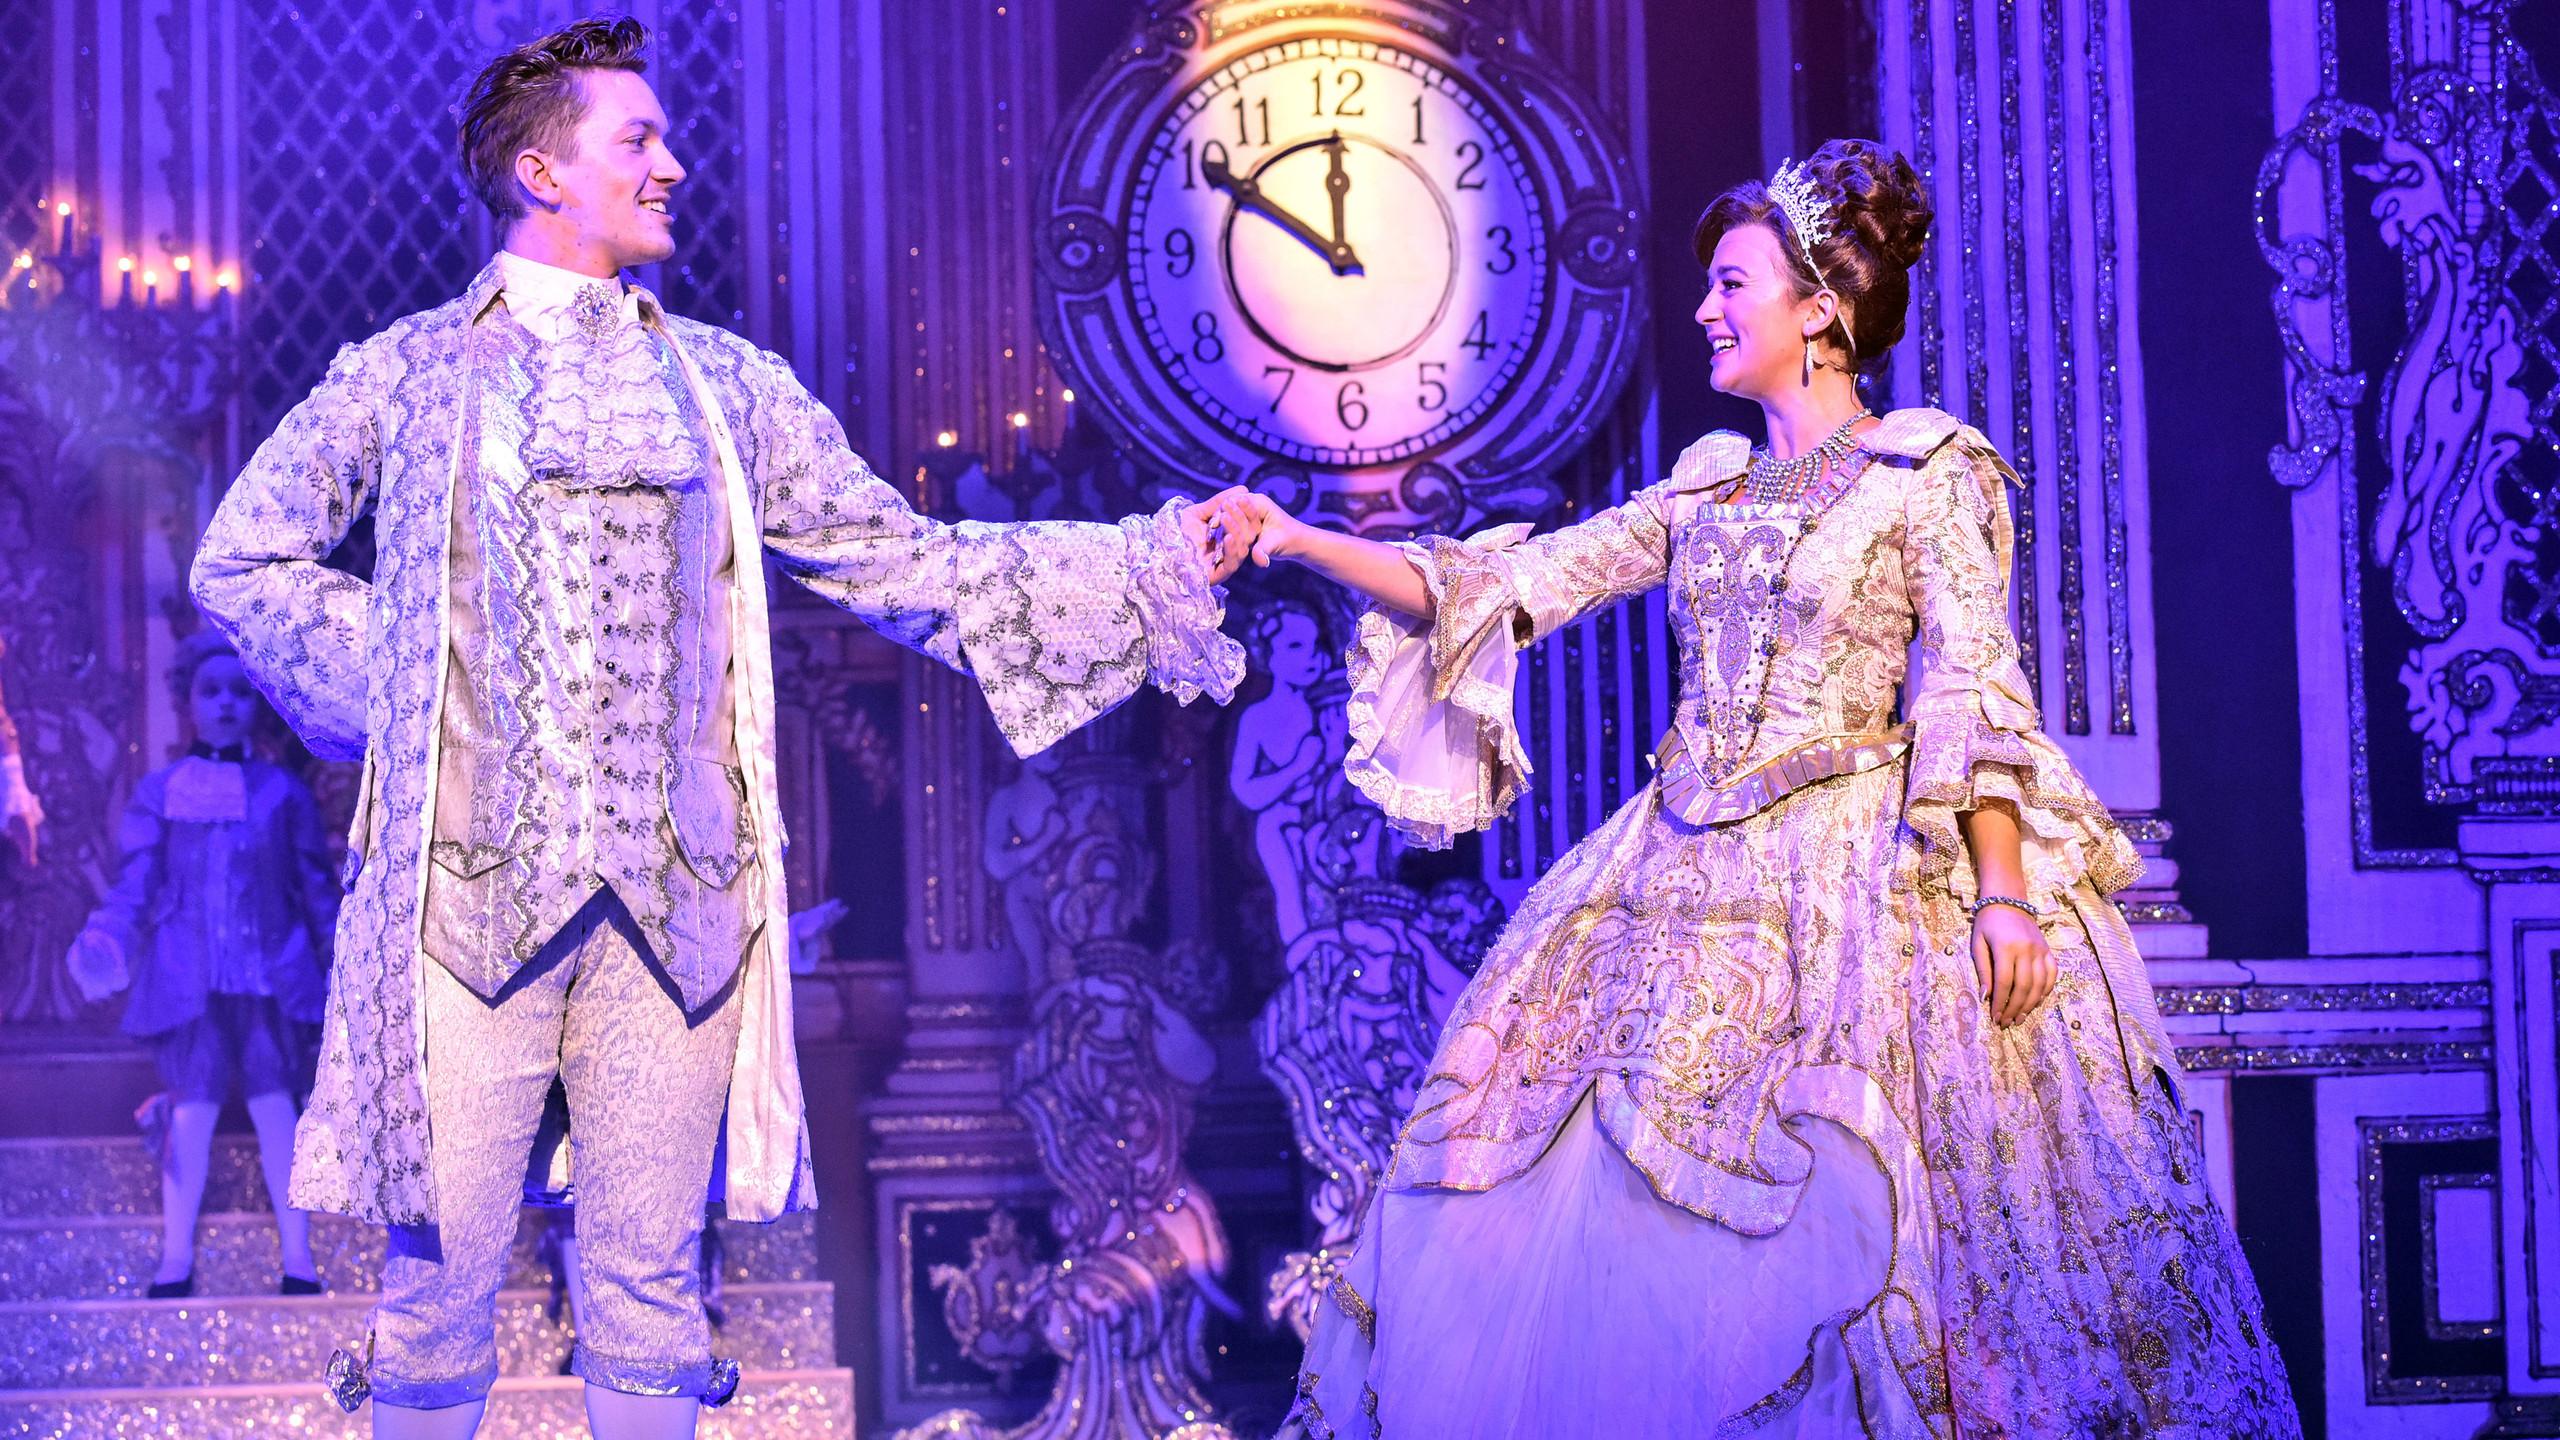 6 Cinderella_Dan Partridge and Charlotte